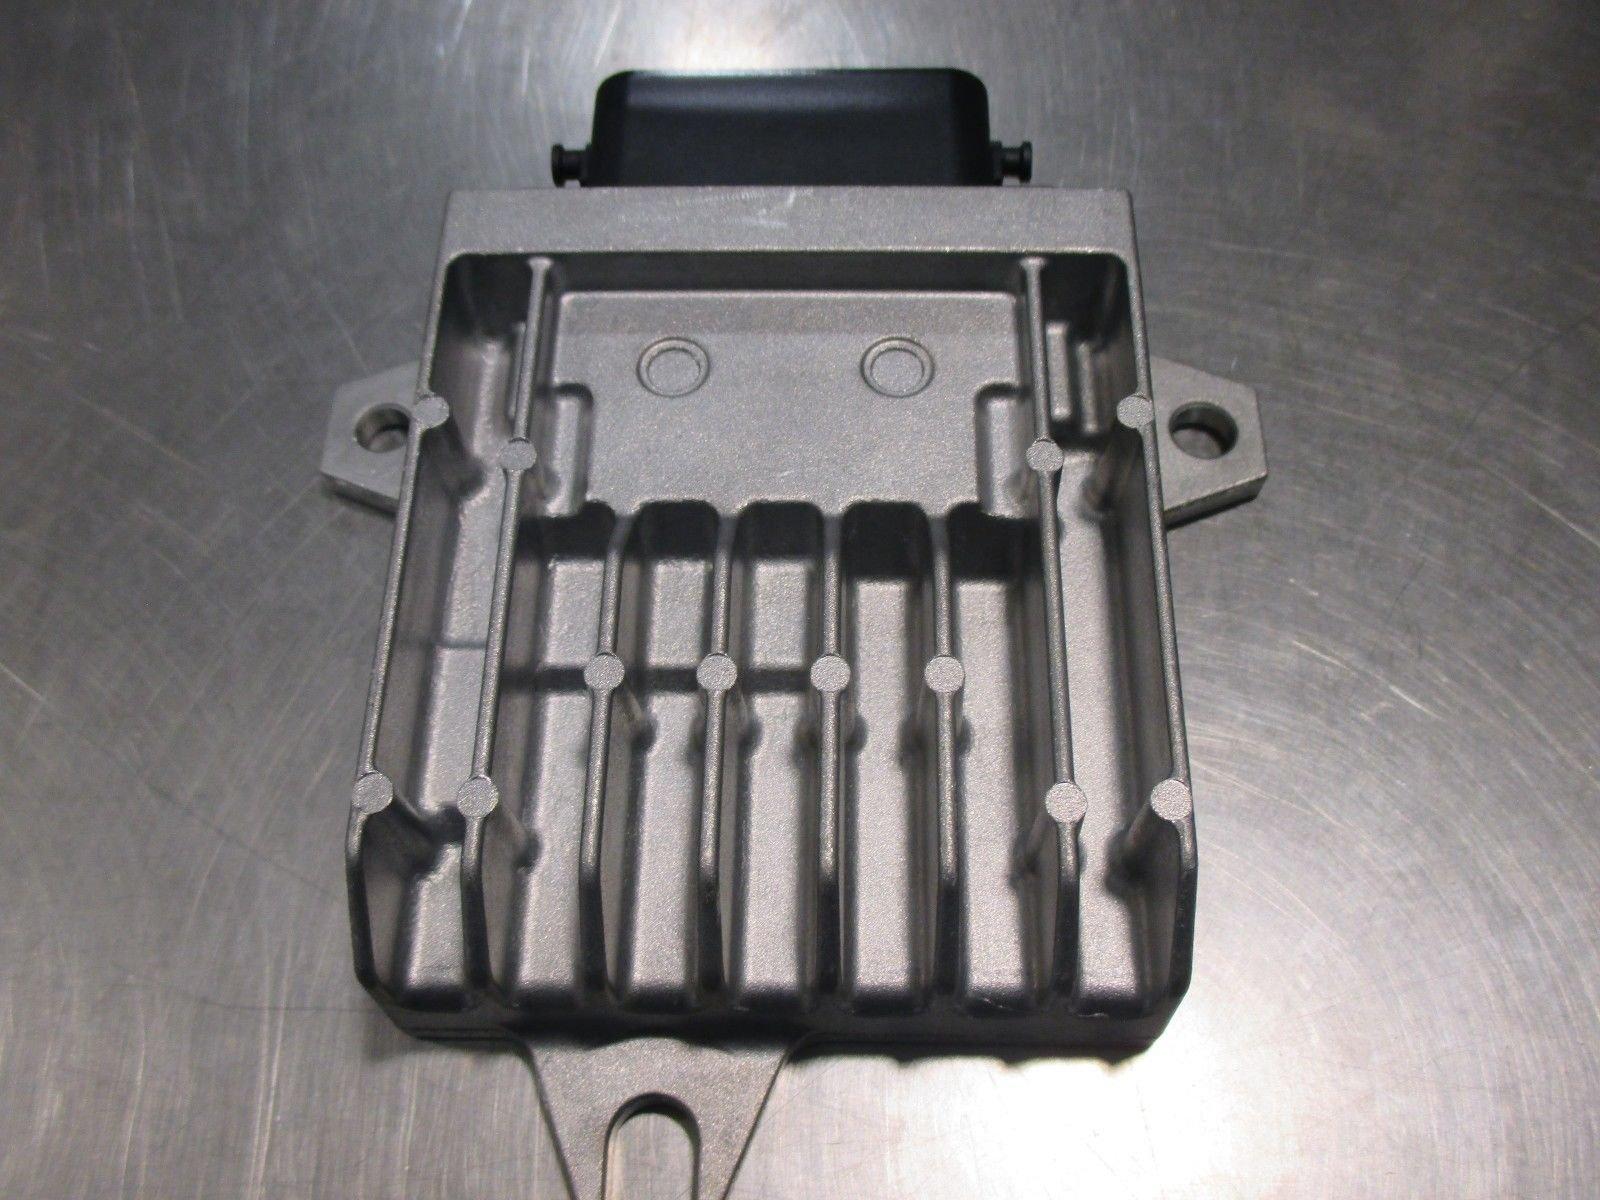 Genuine Mazda 3 2010-2011 OEM Automatic Transmission Control Module LF8M-18-9E1H by Mazda